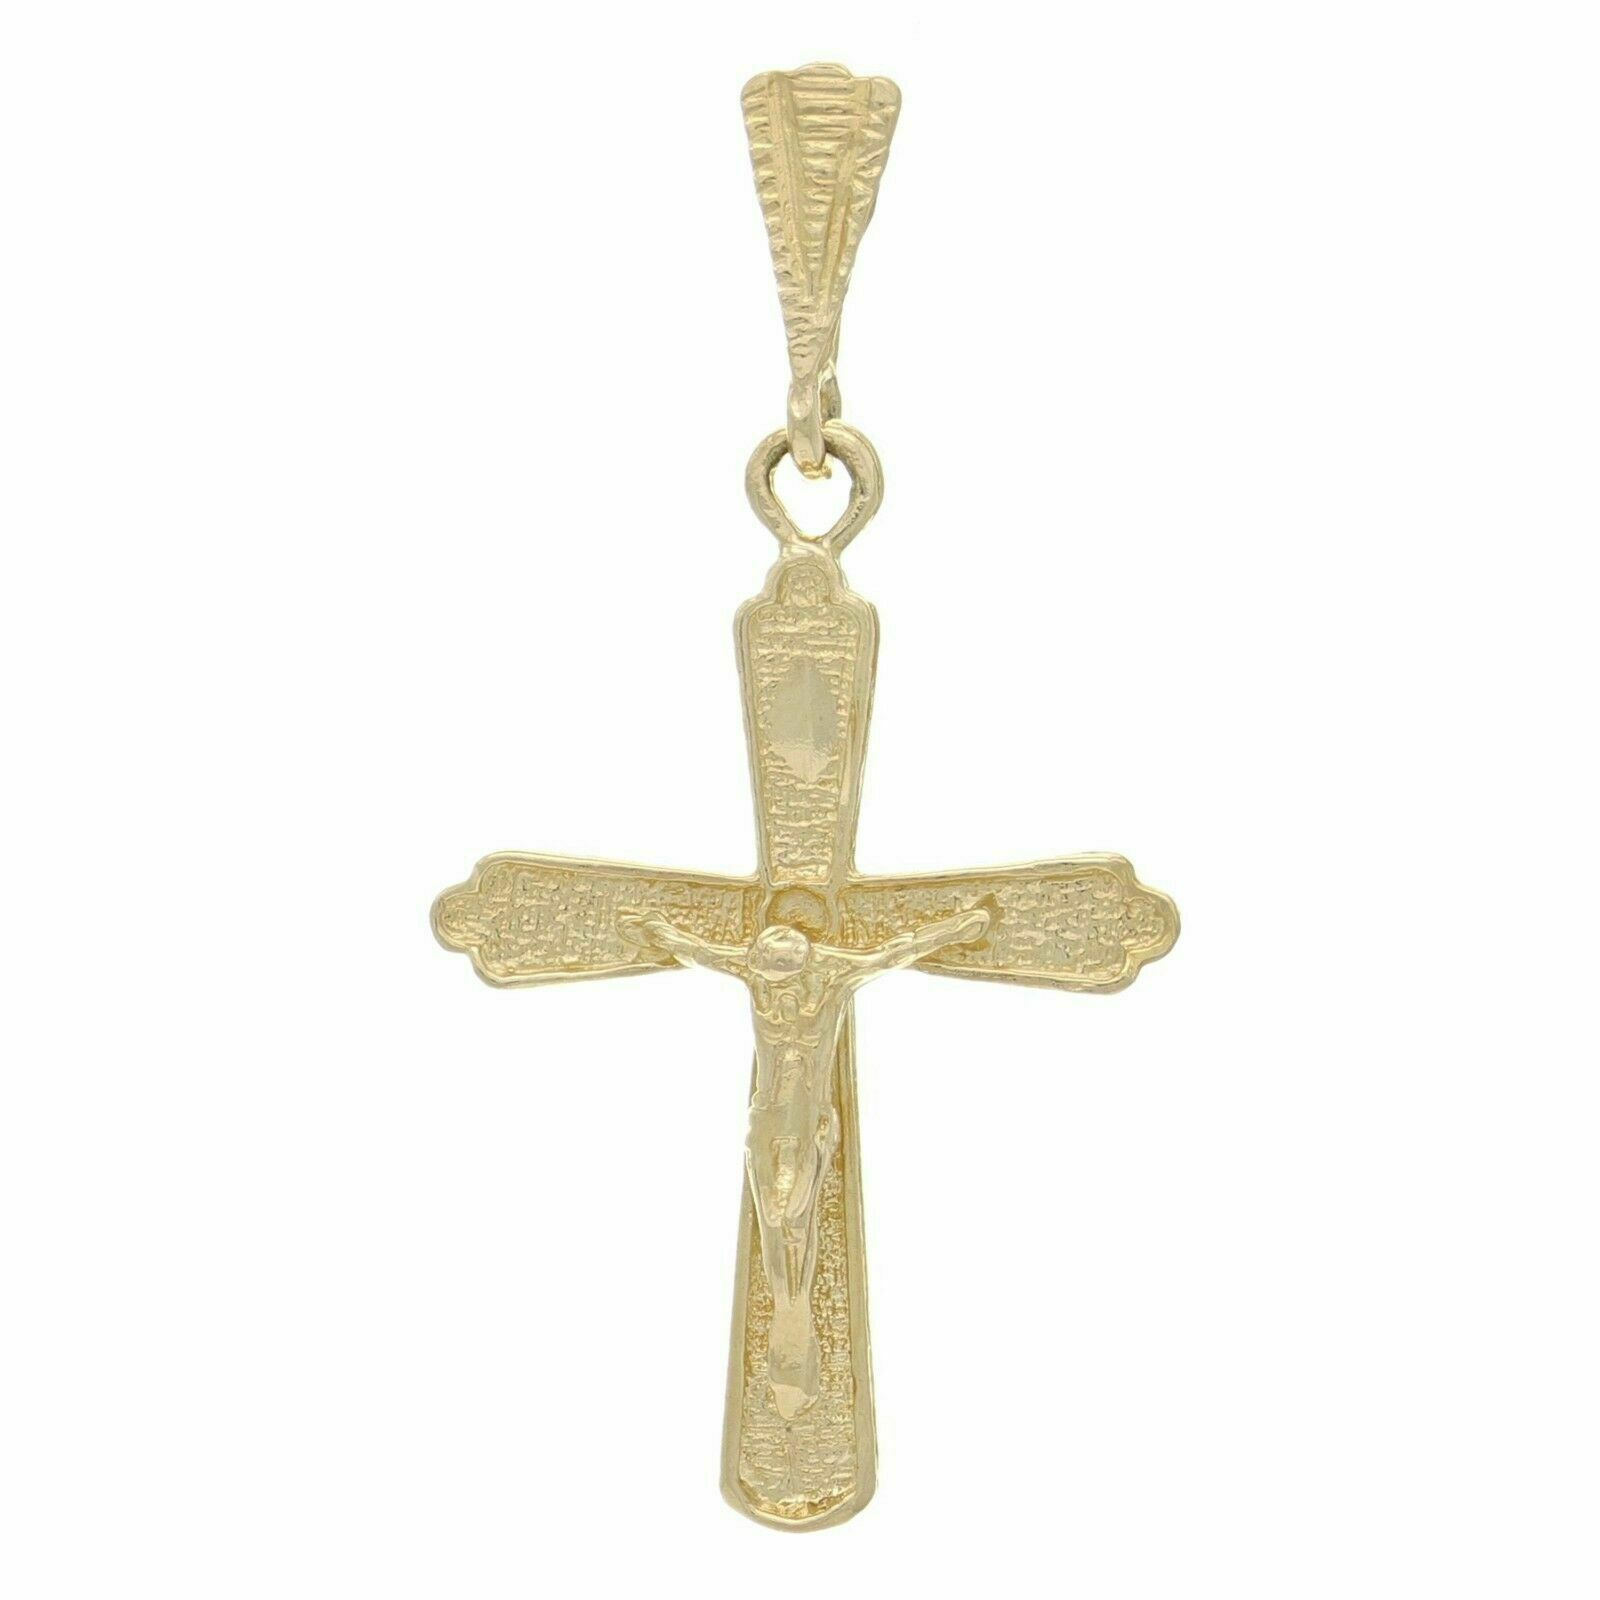 14k White And Yellow Gold Jesus Crucifix Cross Religious Pendant Charm